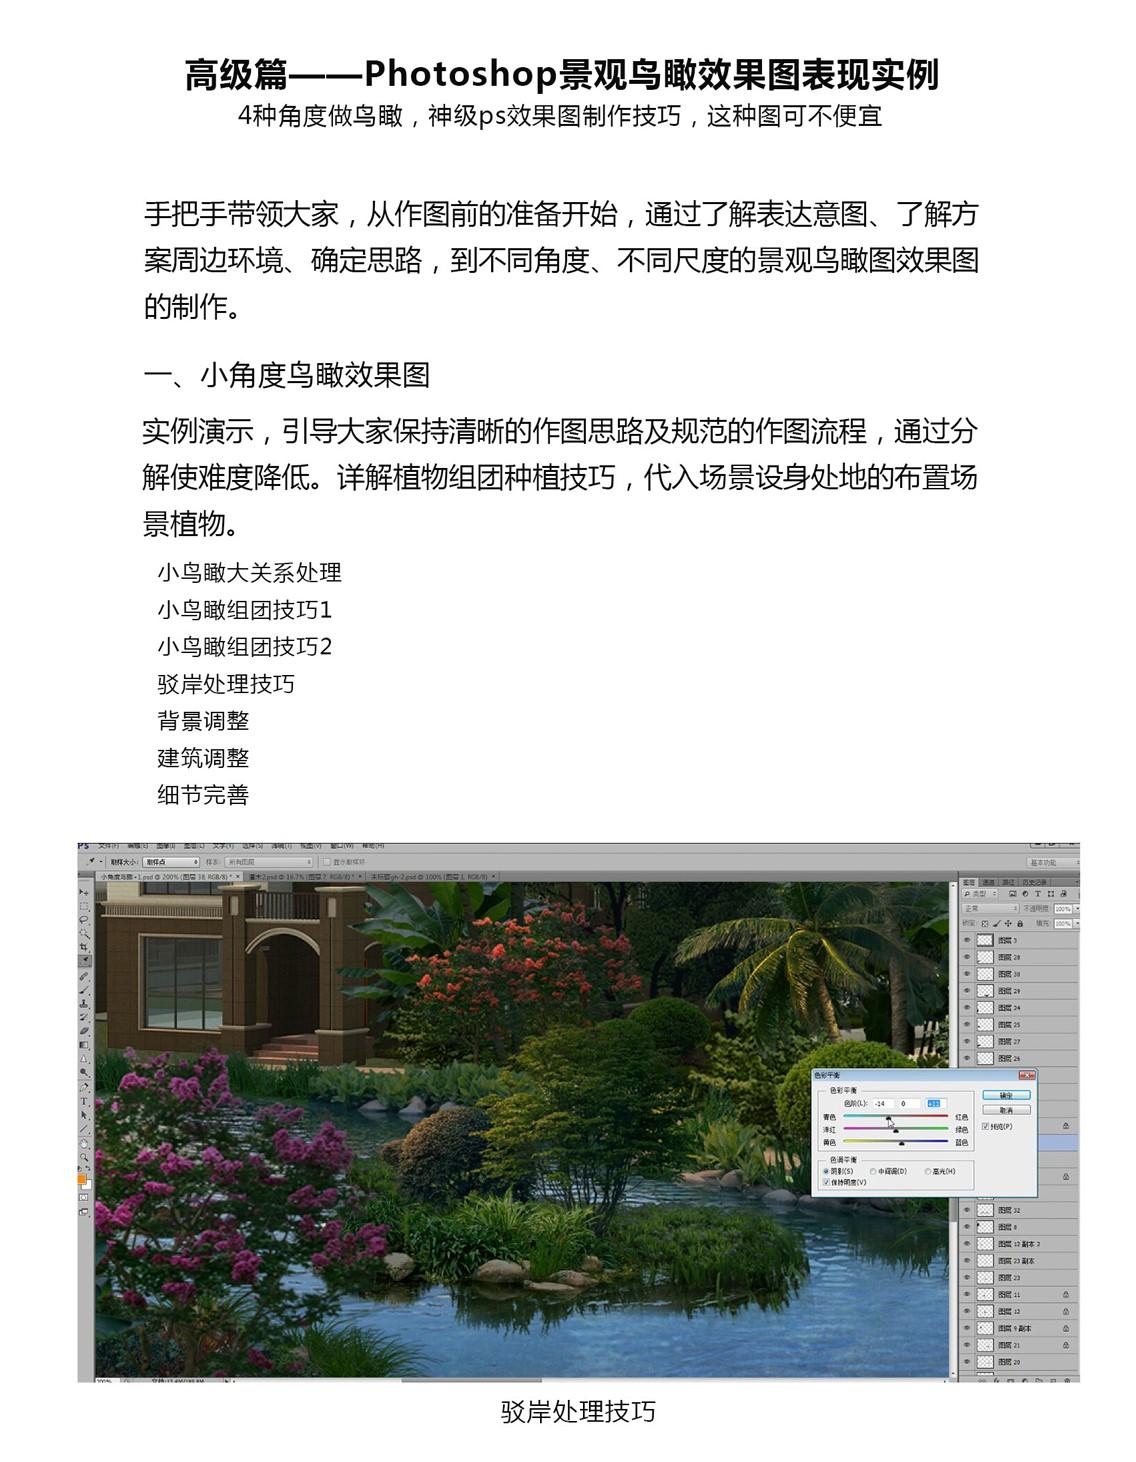 Photoshop景观效果图表现从入门到实战精讲,21个ps景观效果图表现常用工具+13个景观效果图局部处理+4种效果图场景风格转换+4种角度鸟瞰效果图制作!